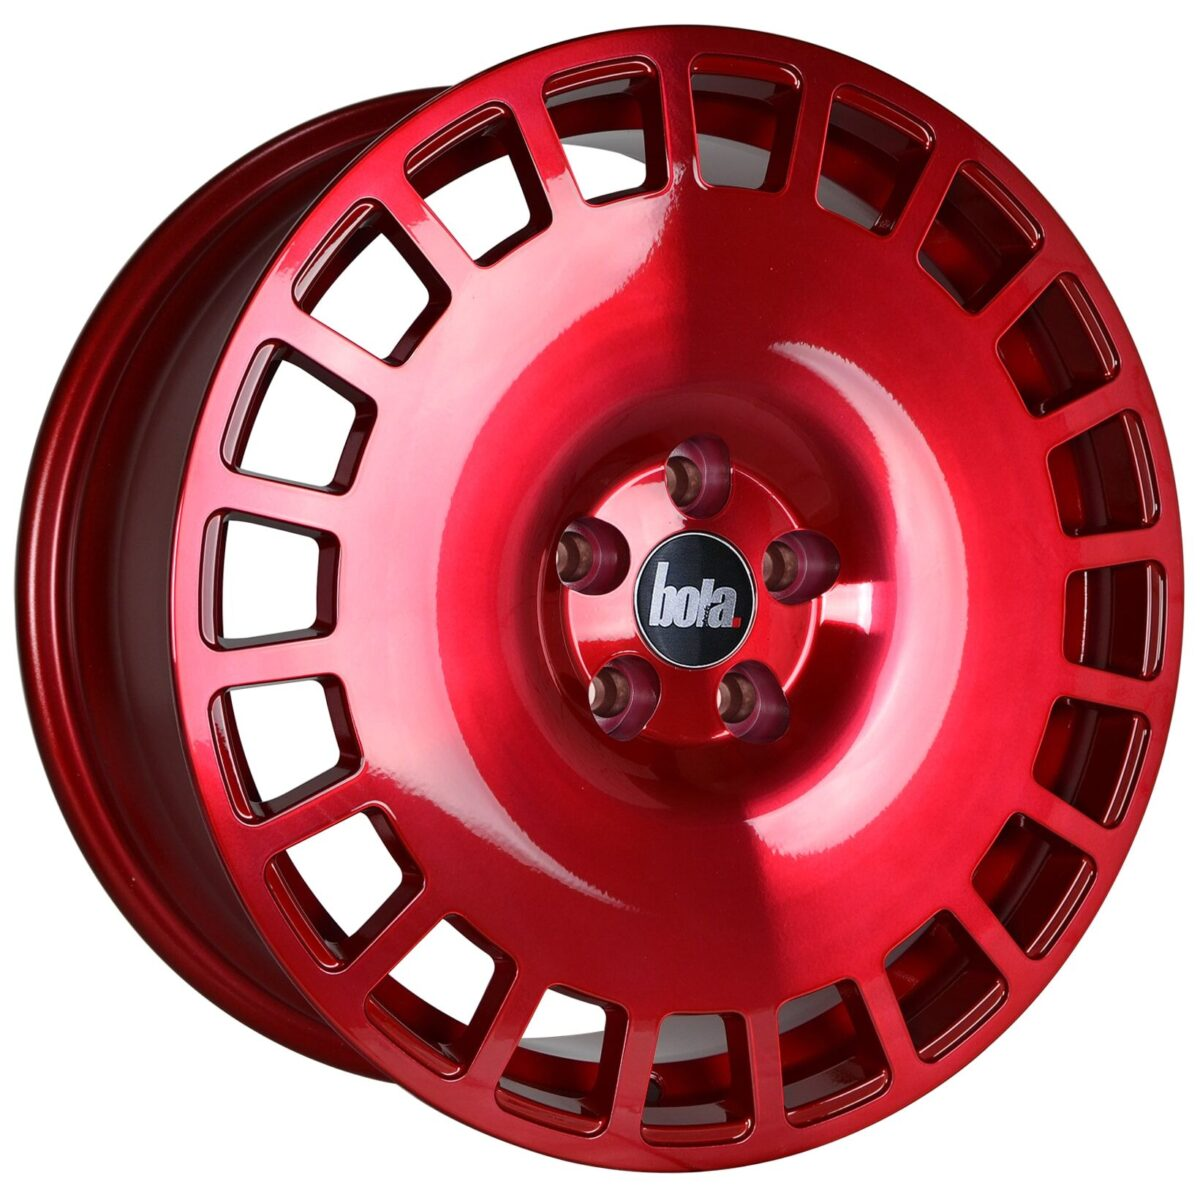 "18"" BOLA B12 Wheels - Hyper Red - VW / Audi / Mercedes - 5x112"